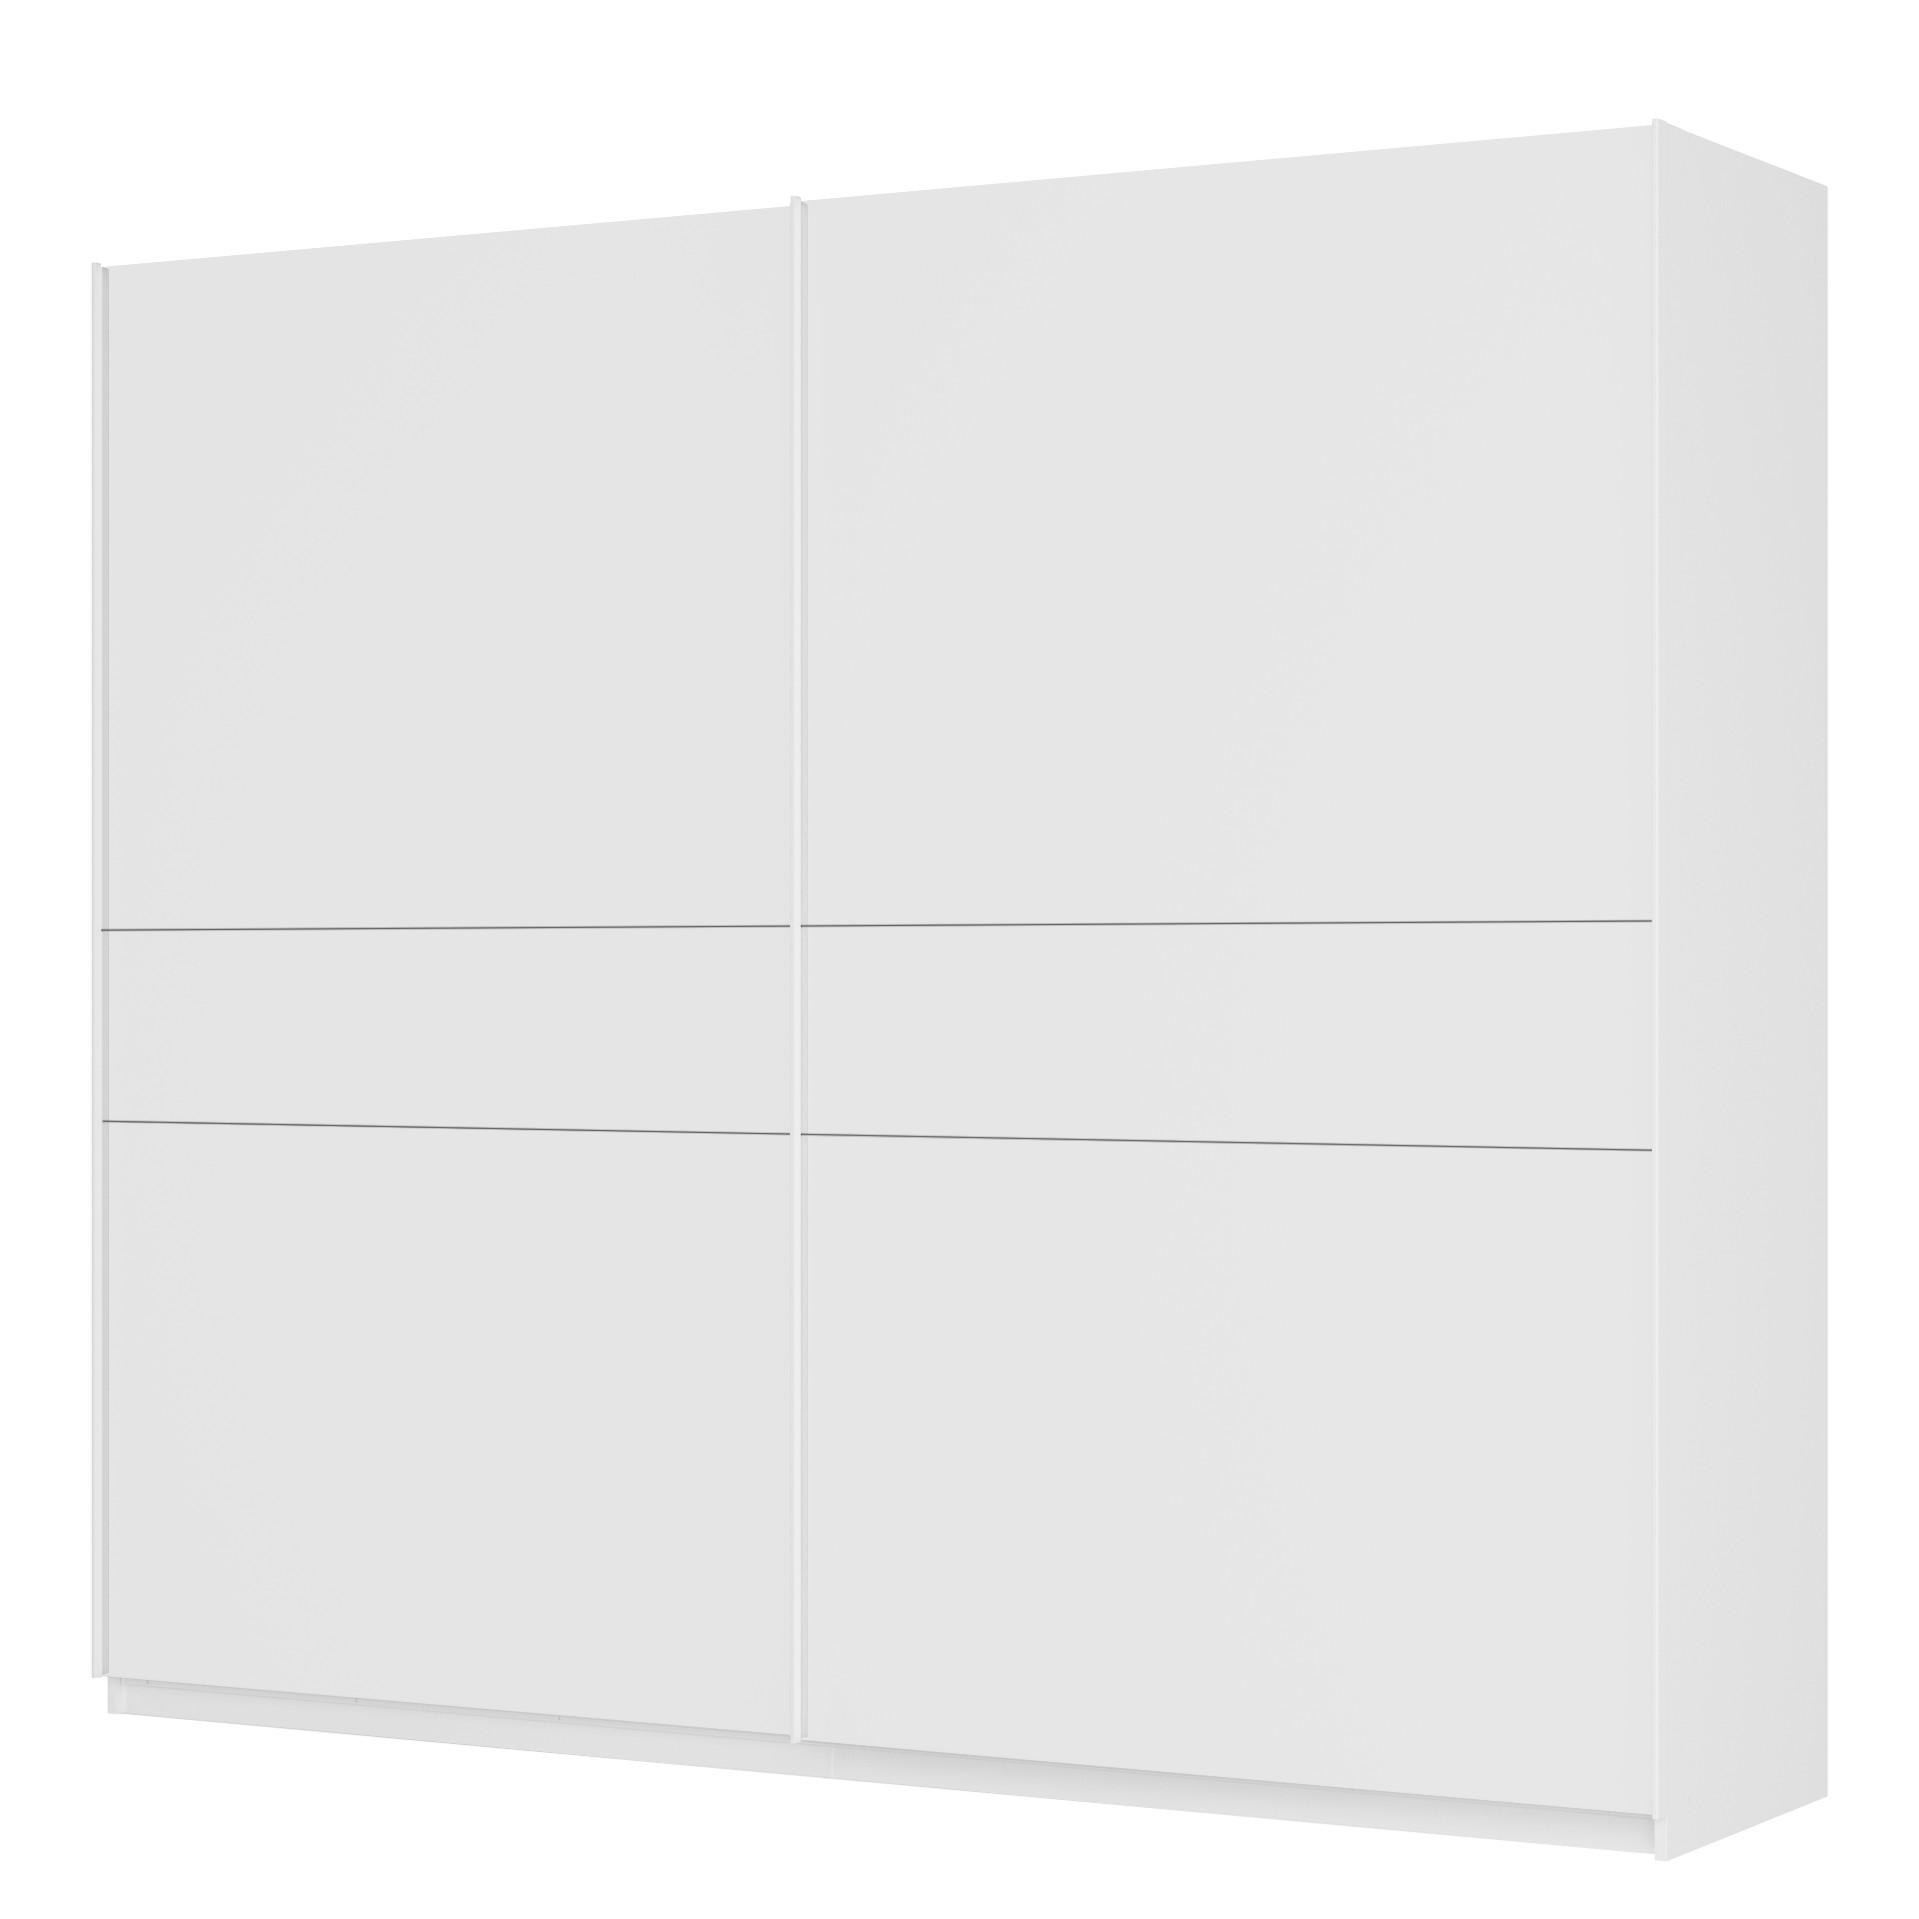 Schwebetürenschrank SKØP - Alpinweiß / Mattglas Weiß - 270 cm (2-türig) - 236 cm - Classic, SKØP